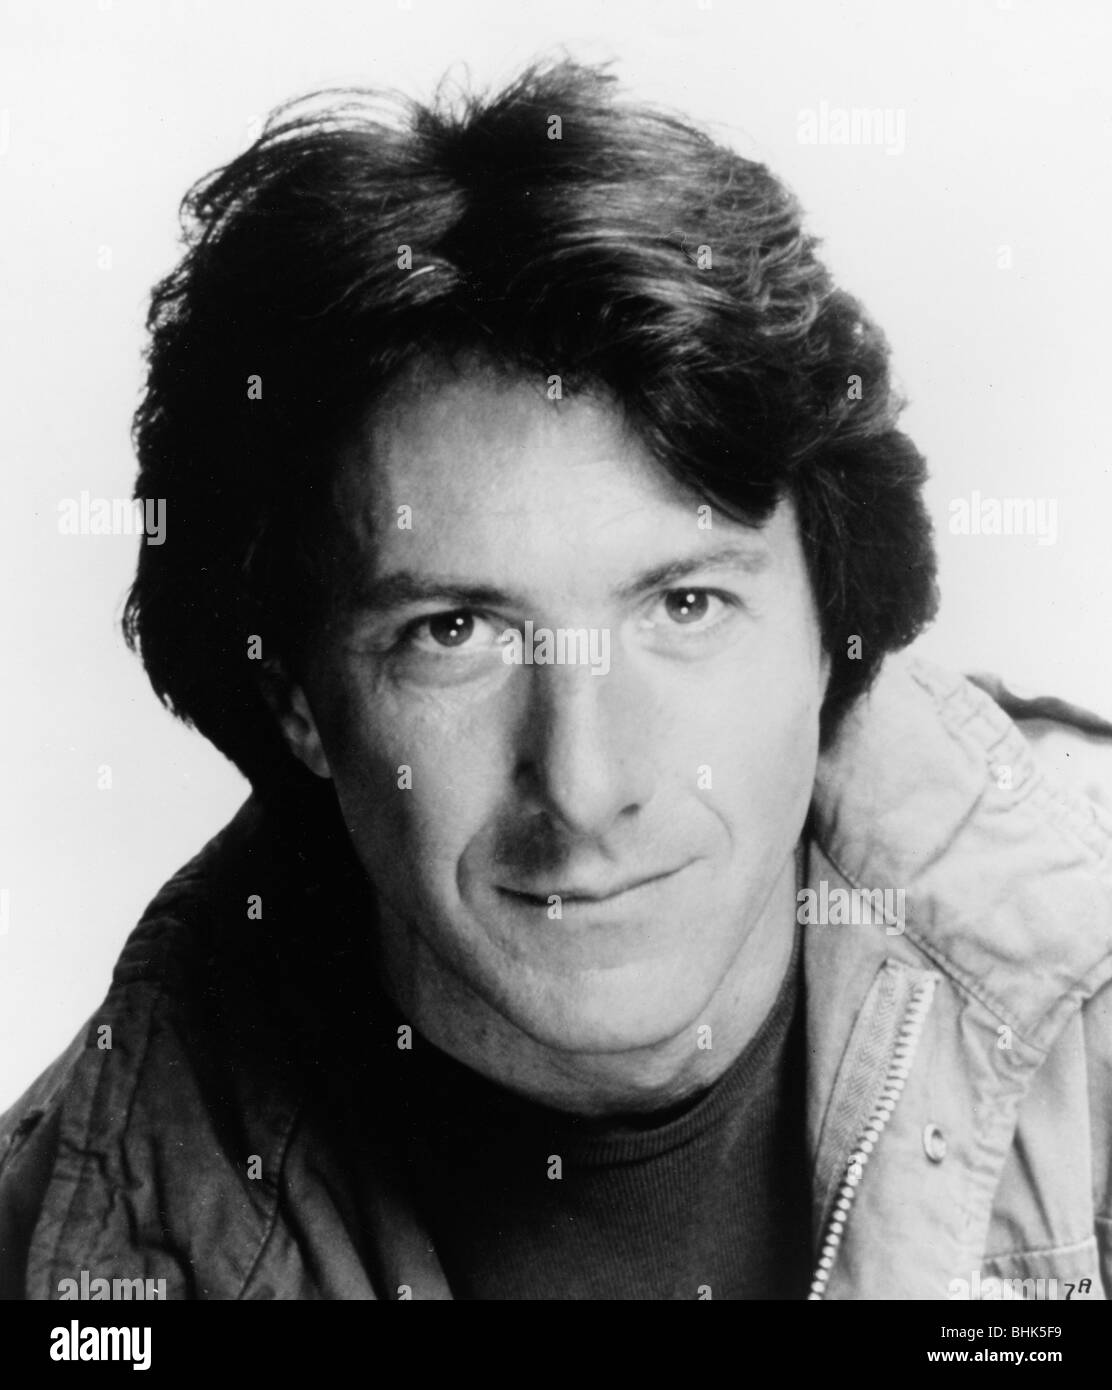 Dustin Hoffman (1937- ), American actor, 1982. - Stock Image